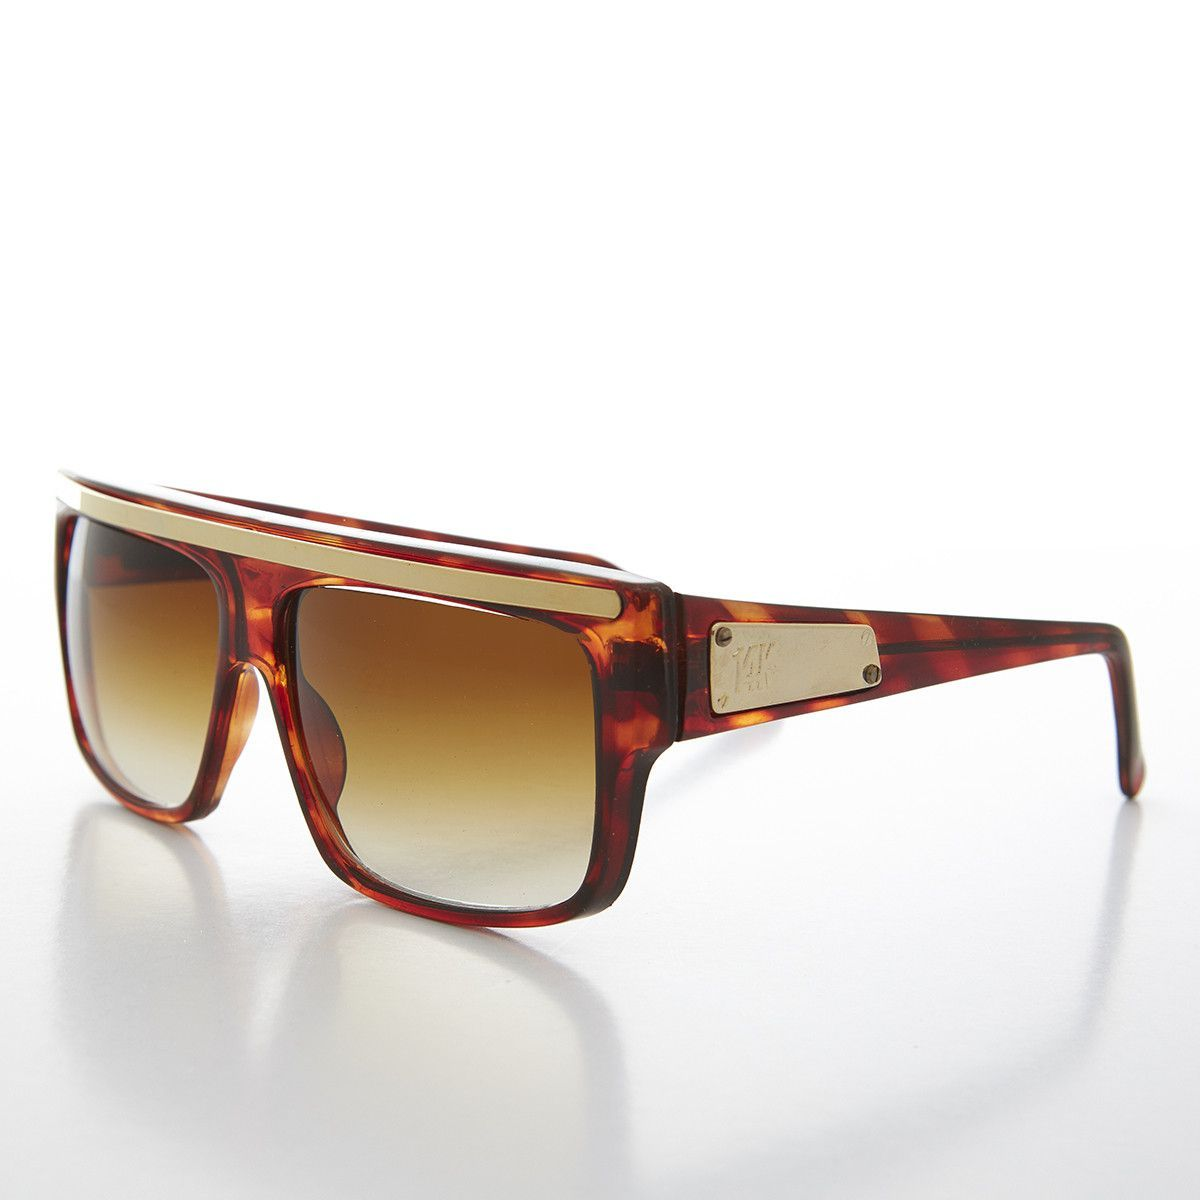 0632e63a675c 90s Hip Hop Flat Top 14k Gold Emblem Vintage Sunglasses NOS - ROYAL